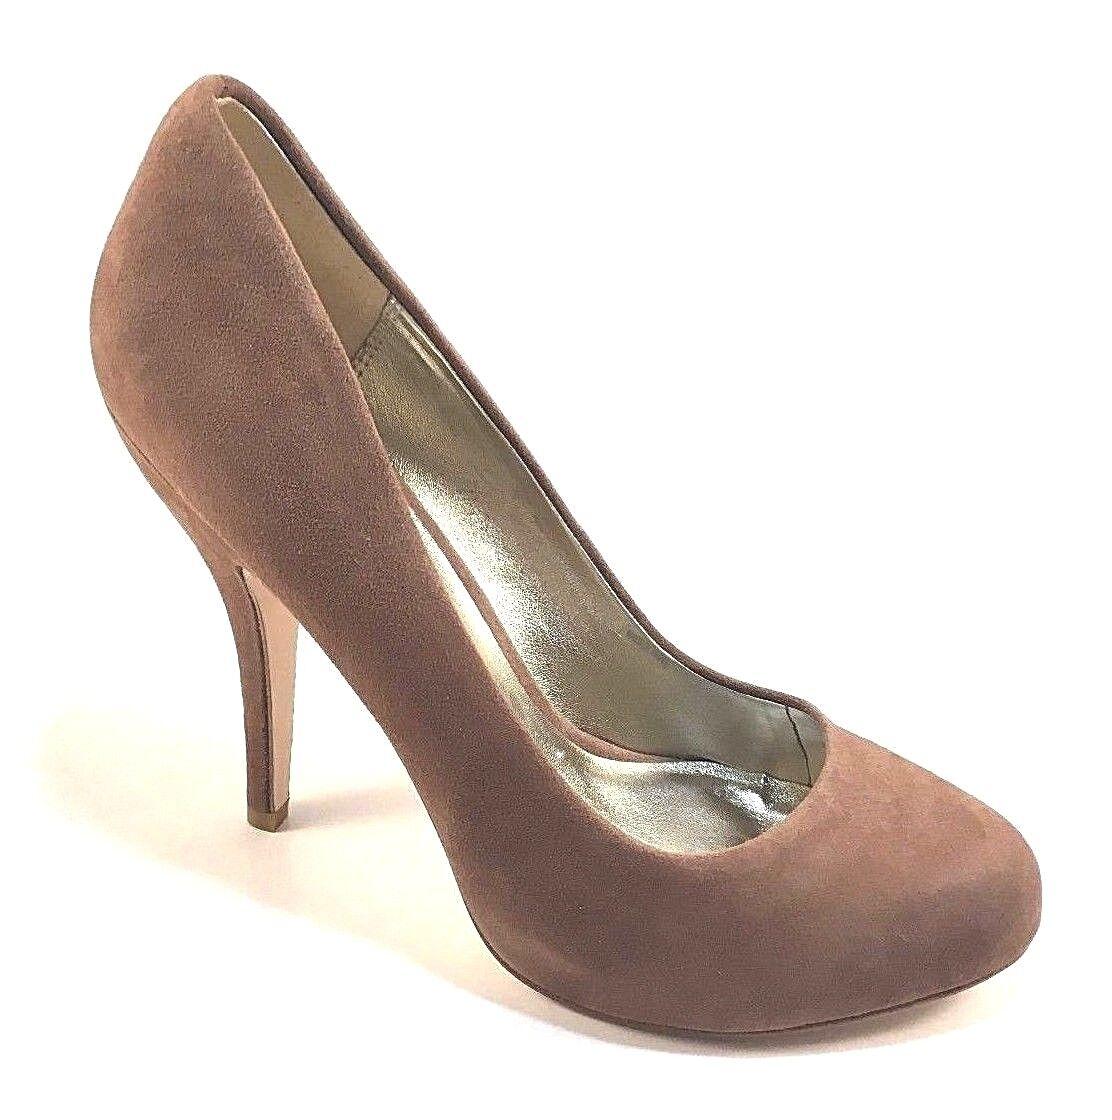 Pelle Moda Yana-12 Latte Suede Leather Round Toe Platform High Heel Pumps